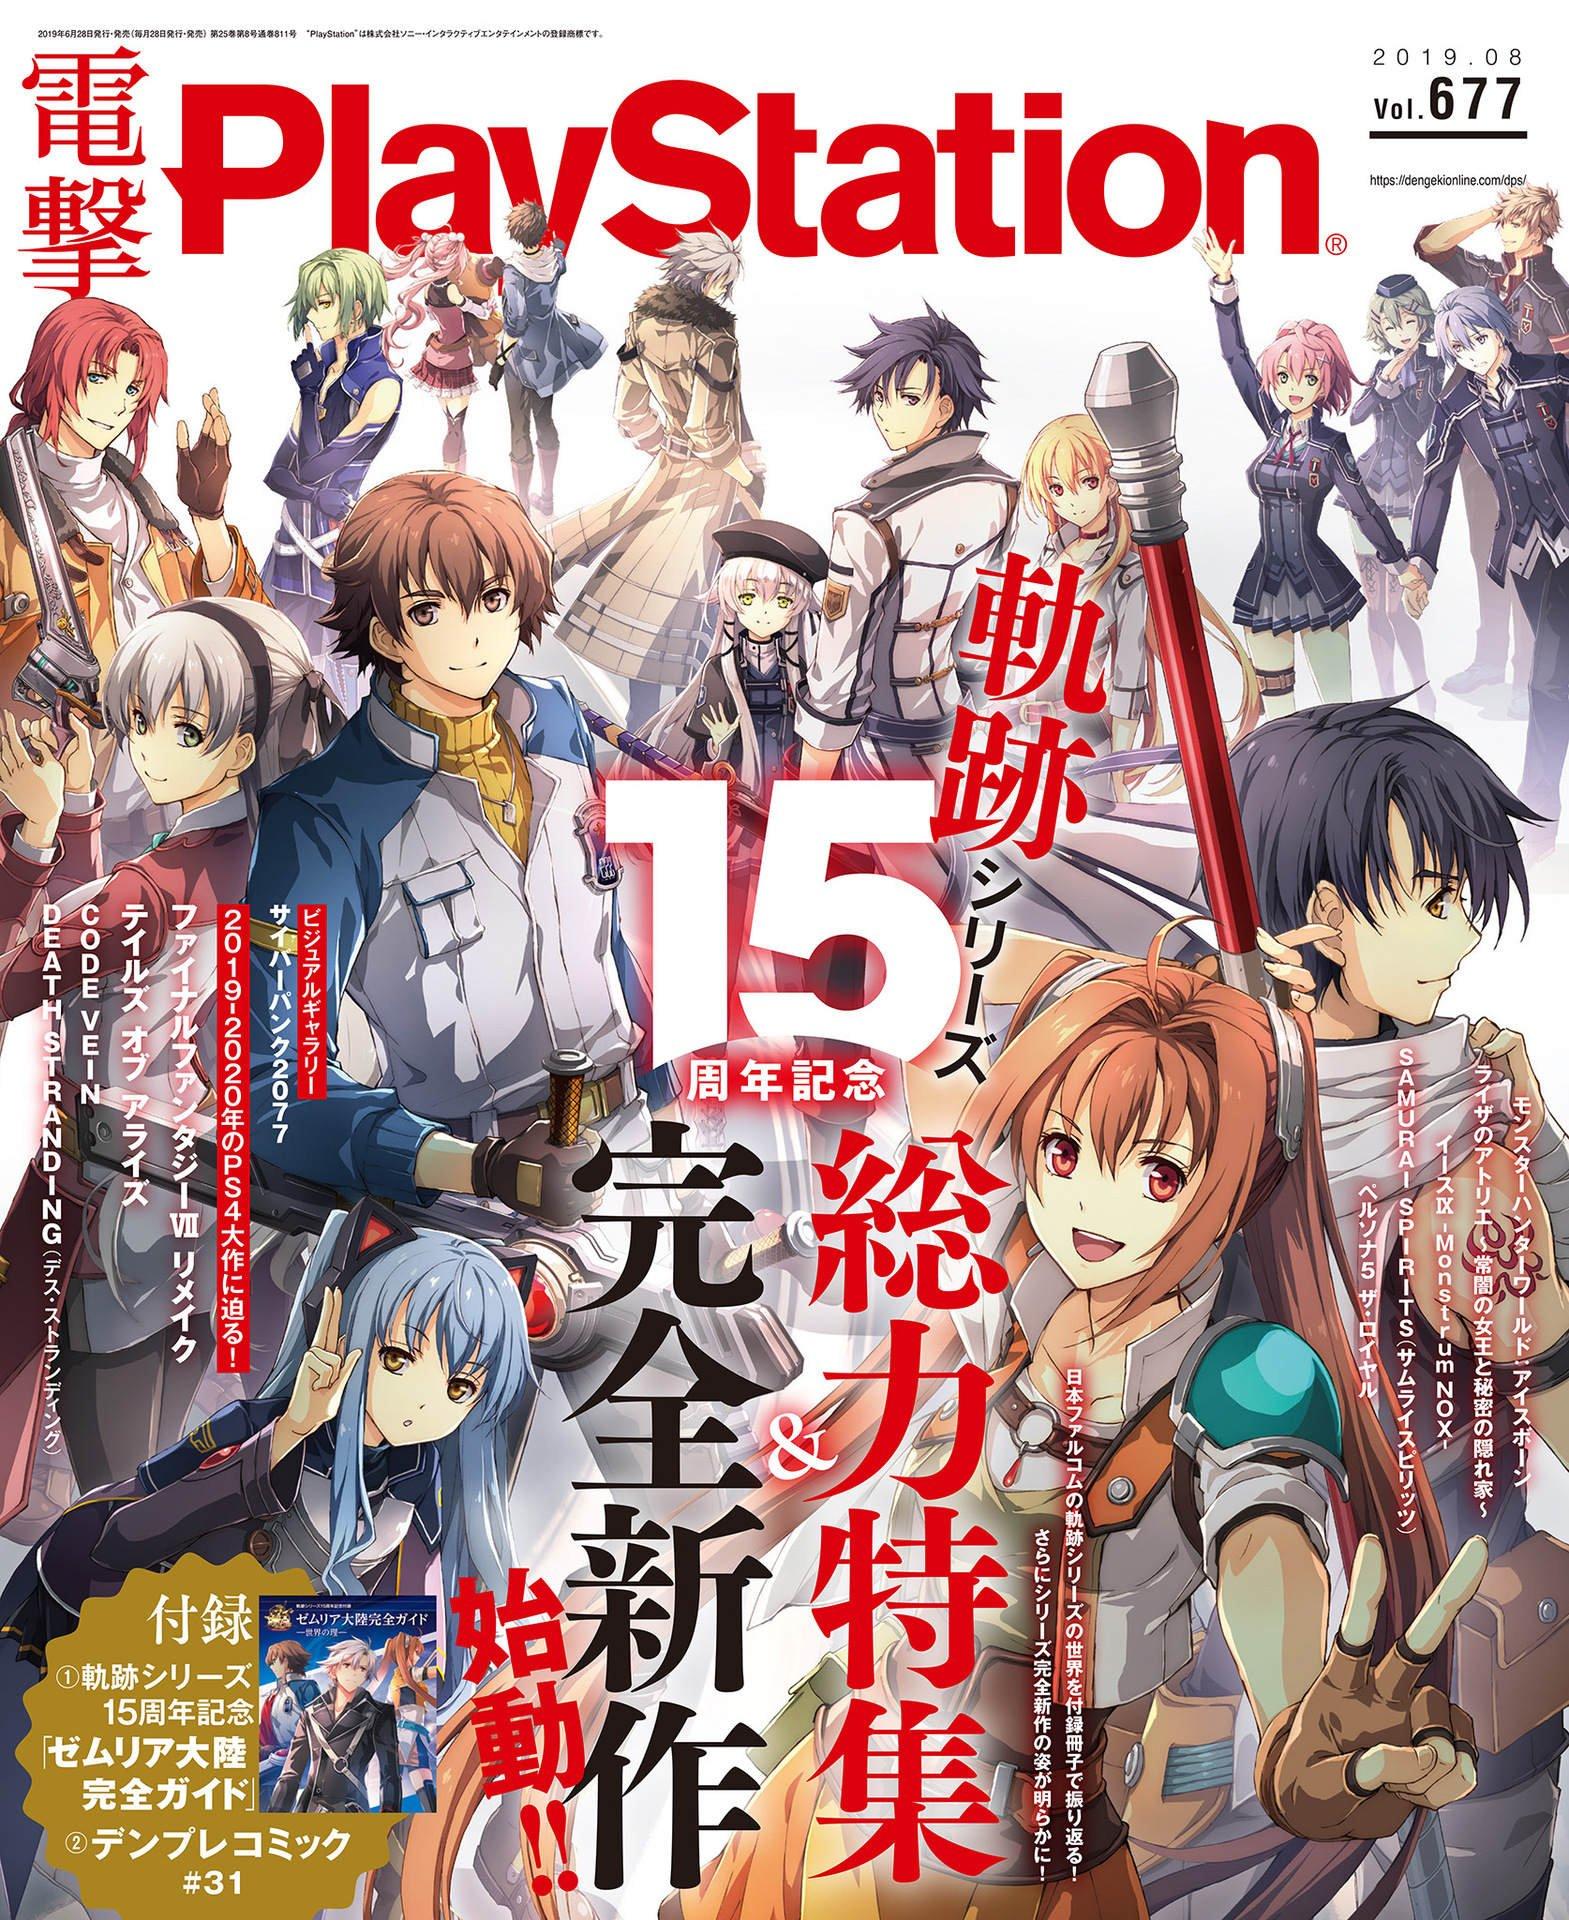 Dengeki PlayStation 677 (August 2019)